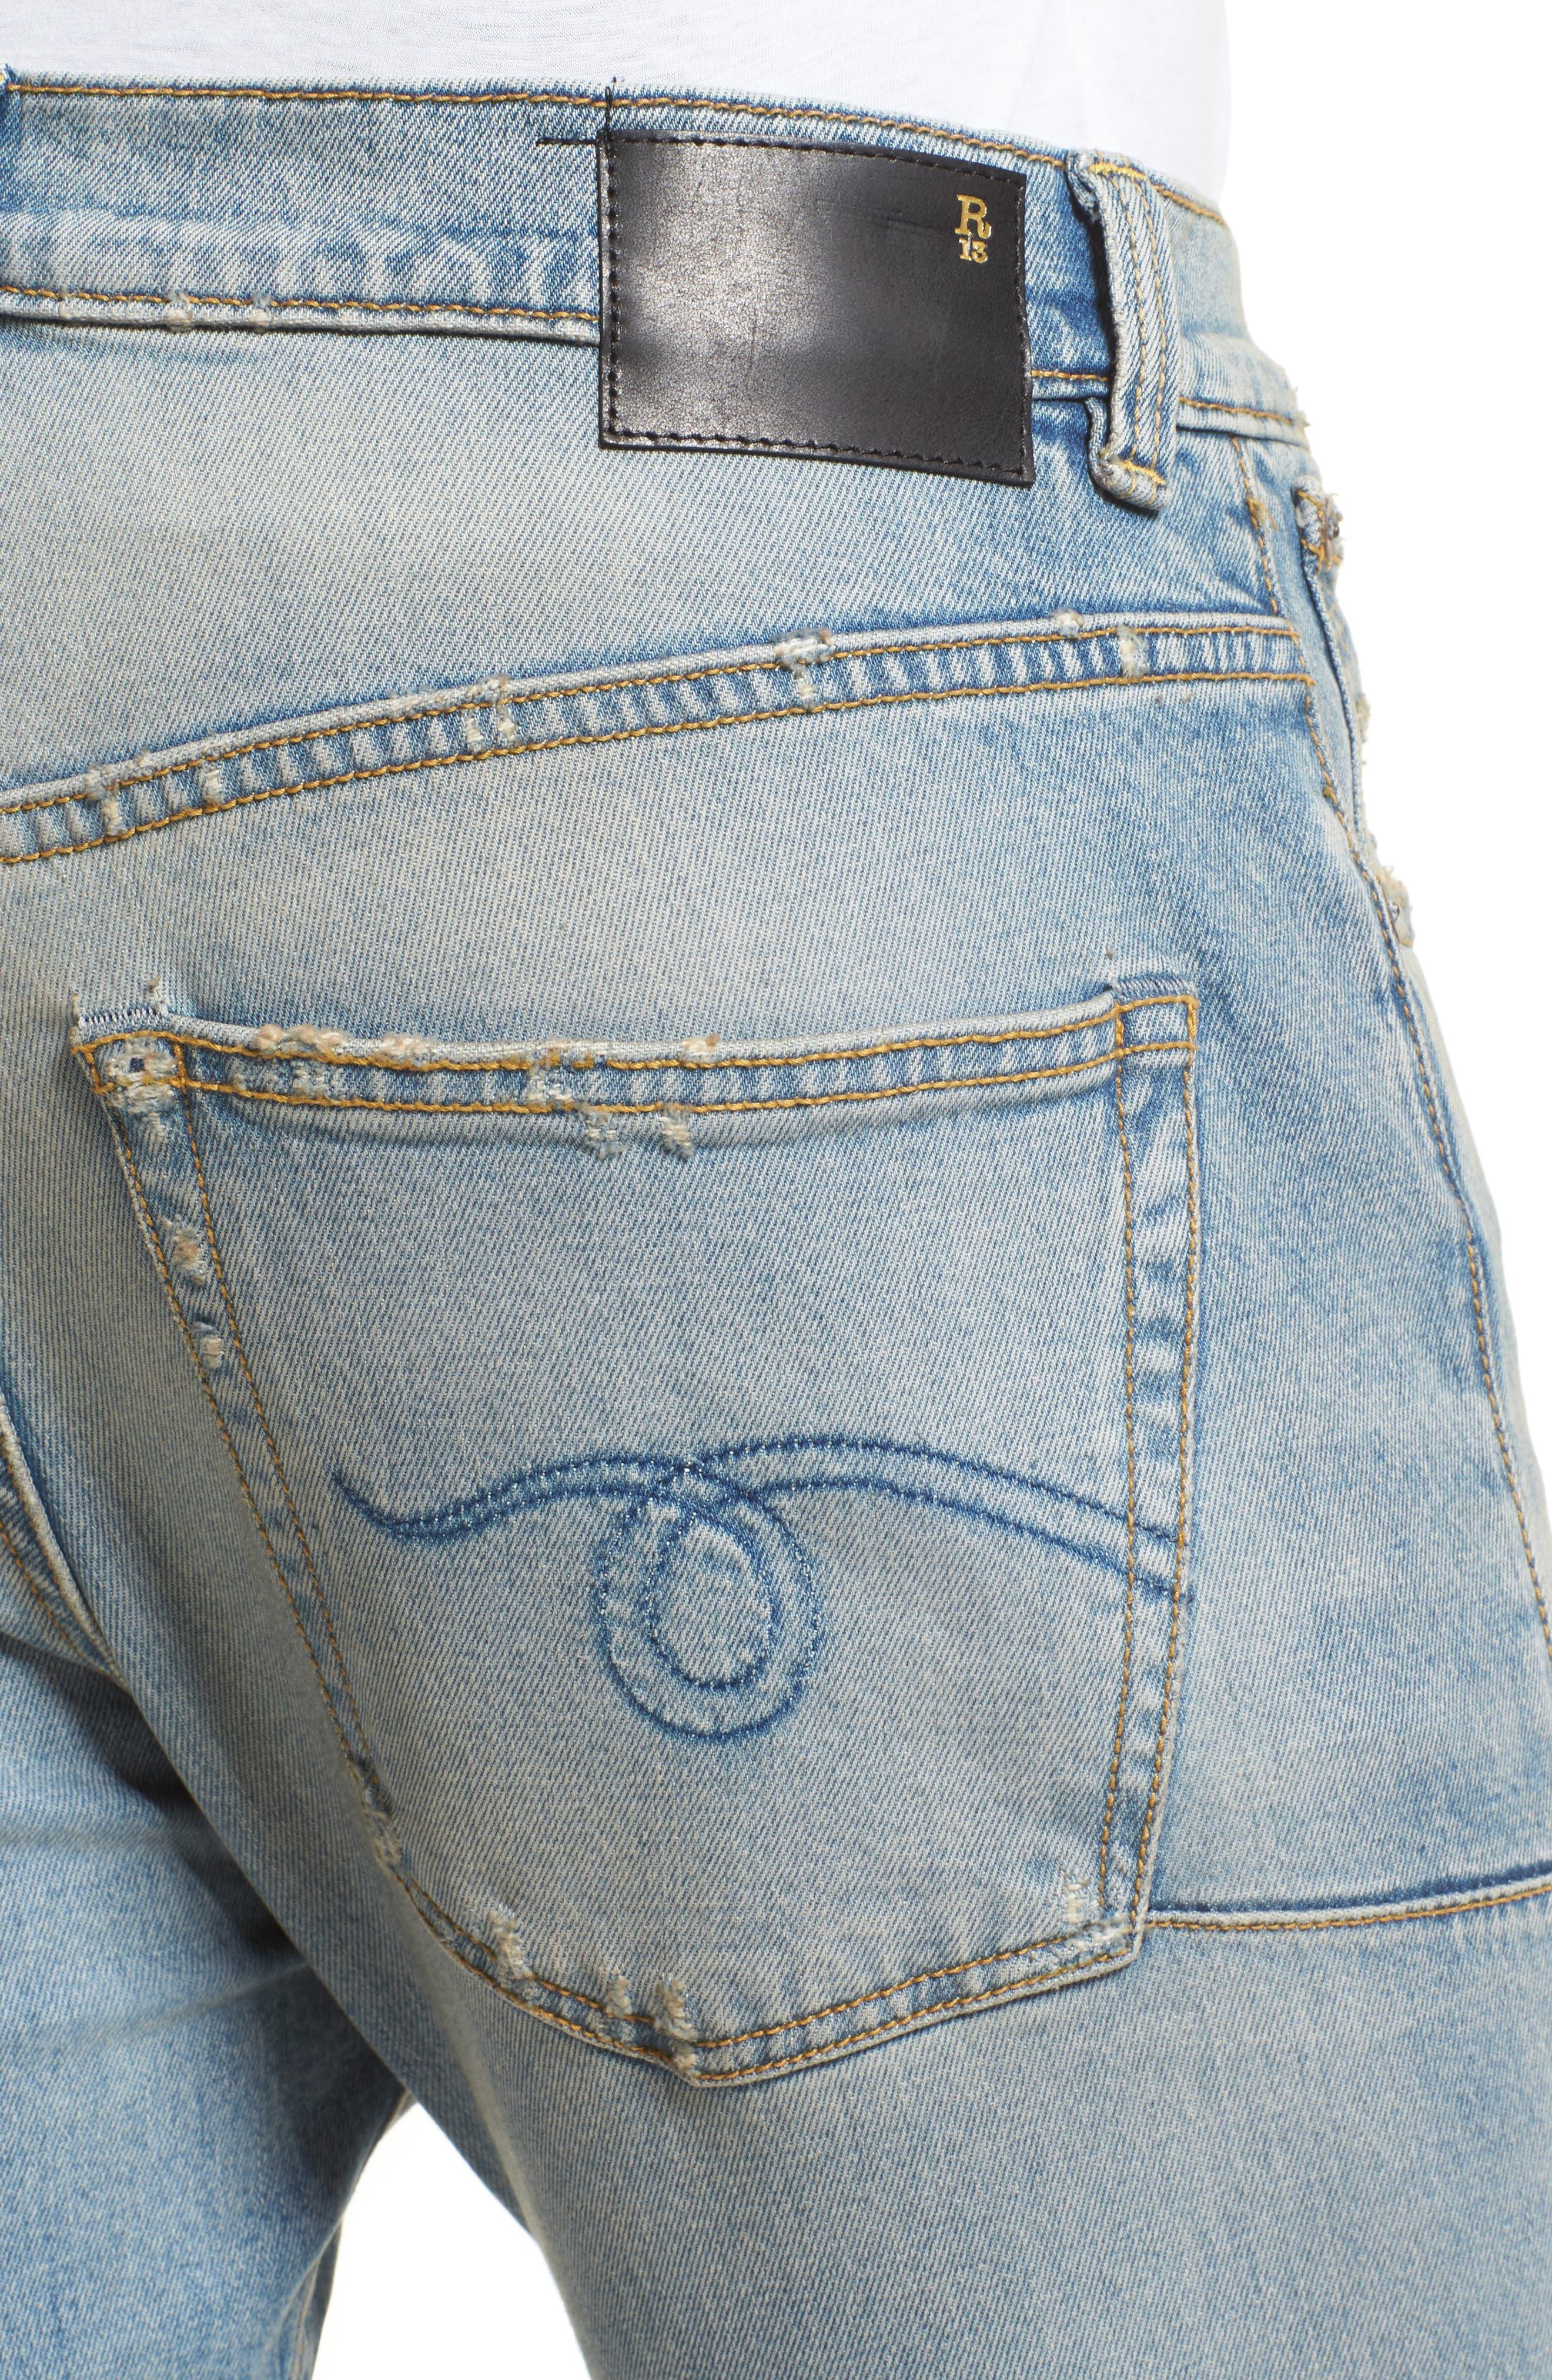 Boy Clean Jeans,                             Alternate thumbnail 4, color,                             LEYTON